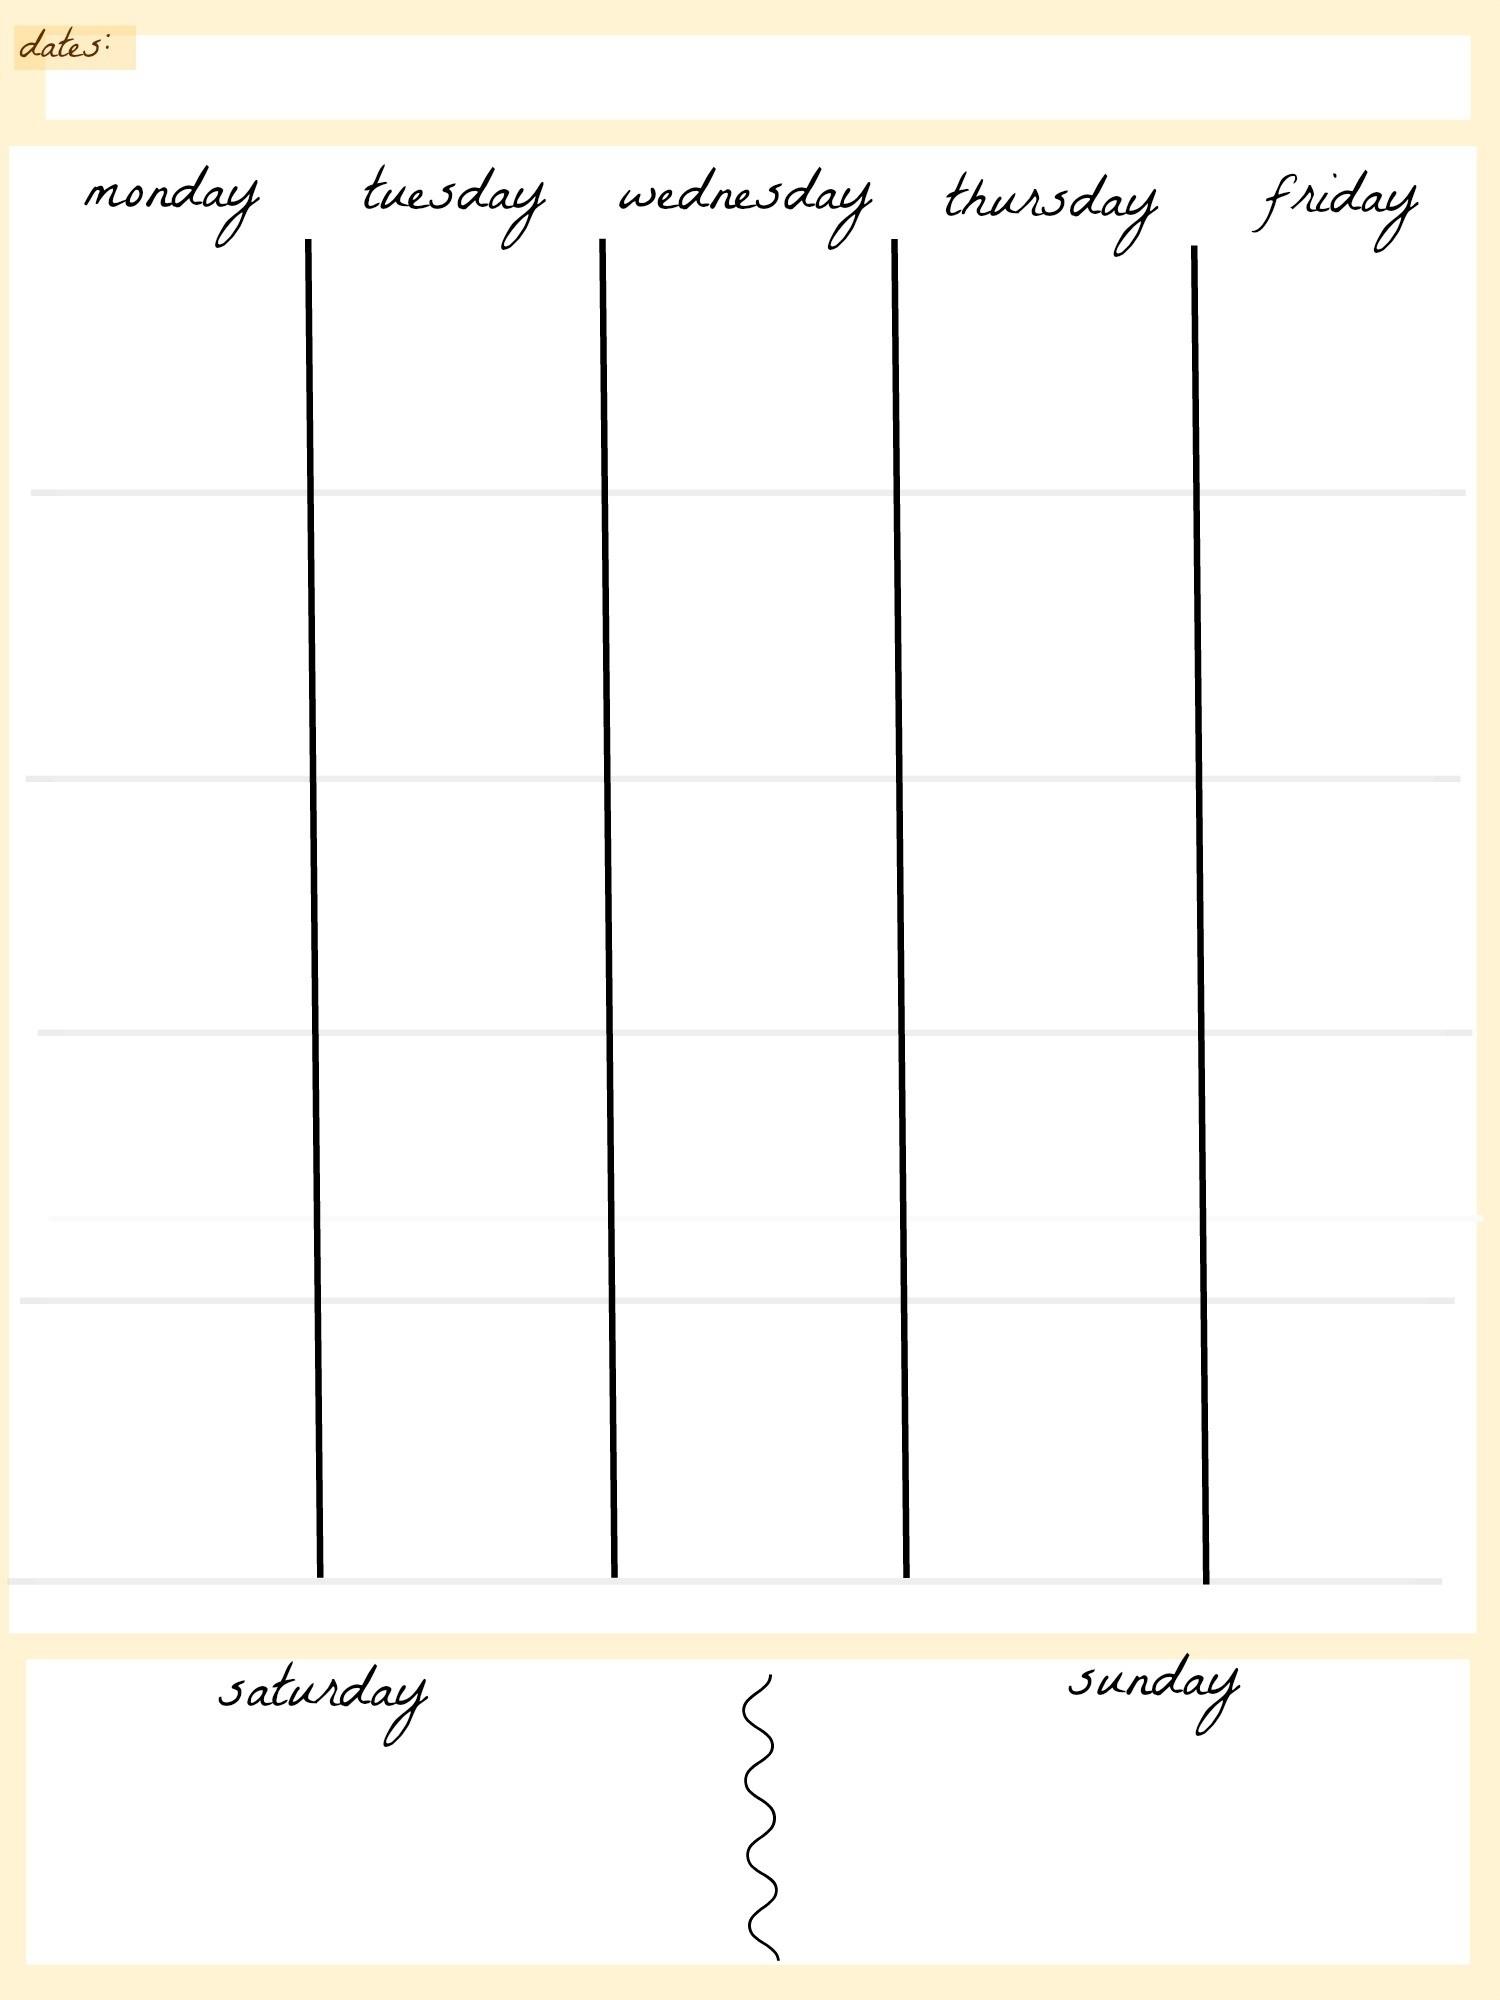 Printable 5 Week Calendar | Printable Calendar 2019 inside Blank Calendar Printable 5 Day